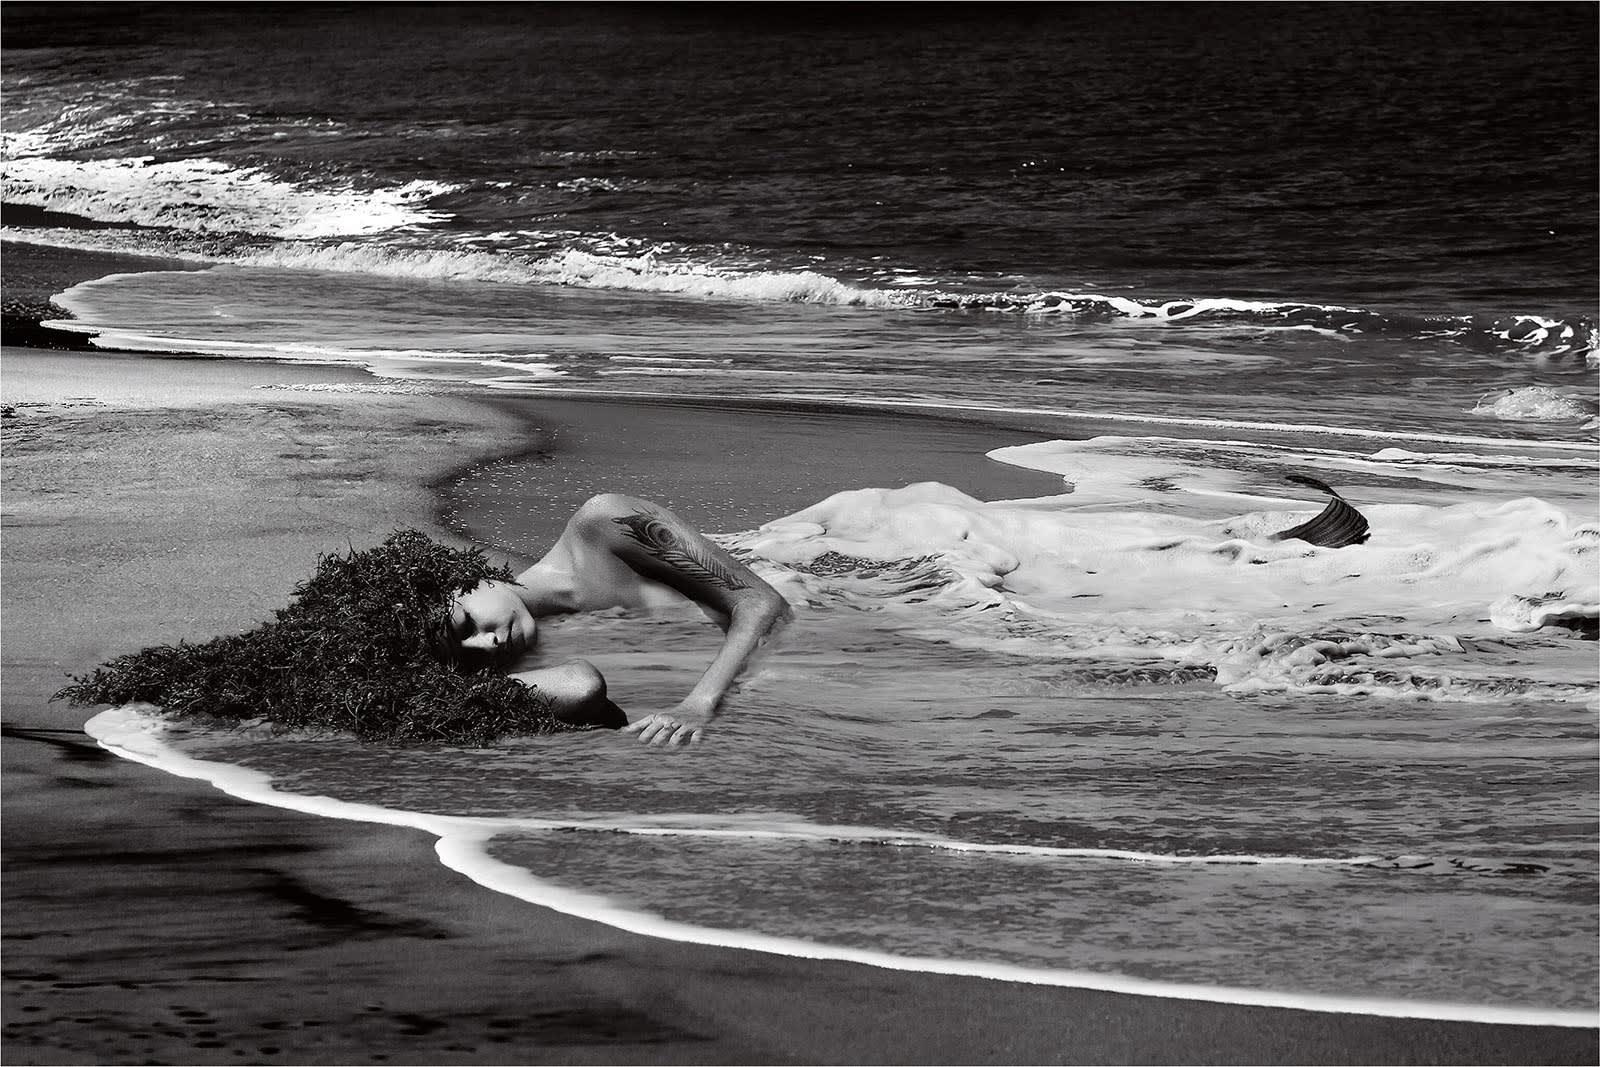 Alain Lacki, Ordinary mermaid, 2016